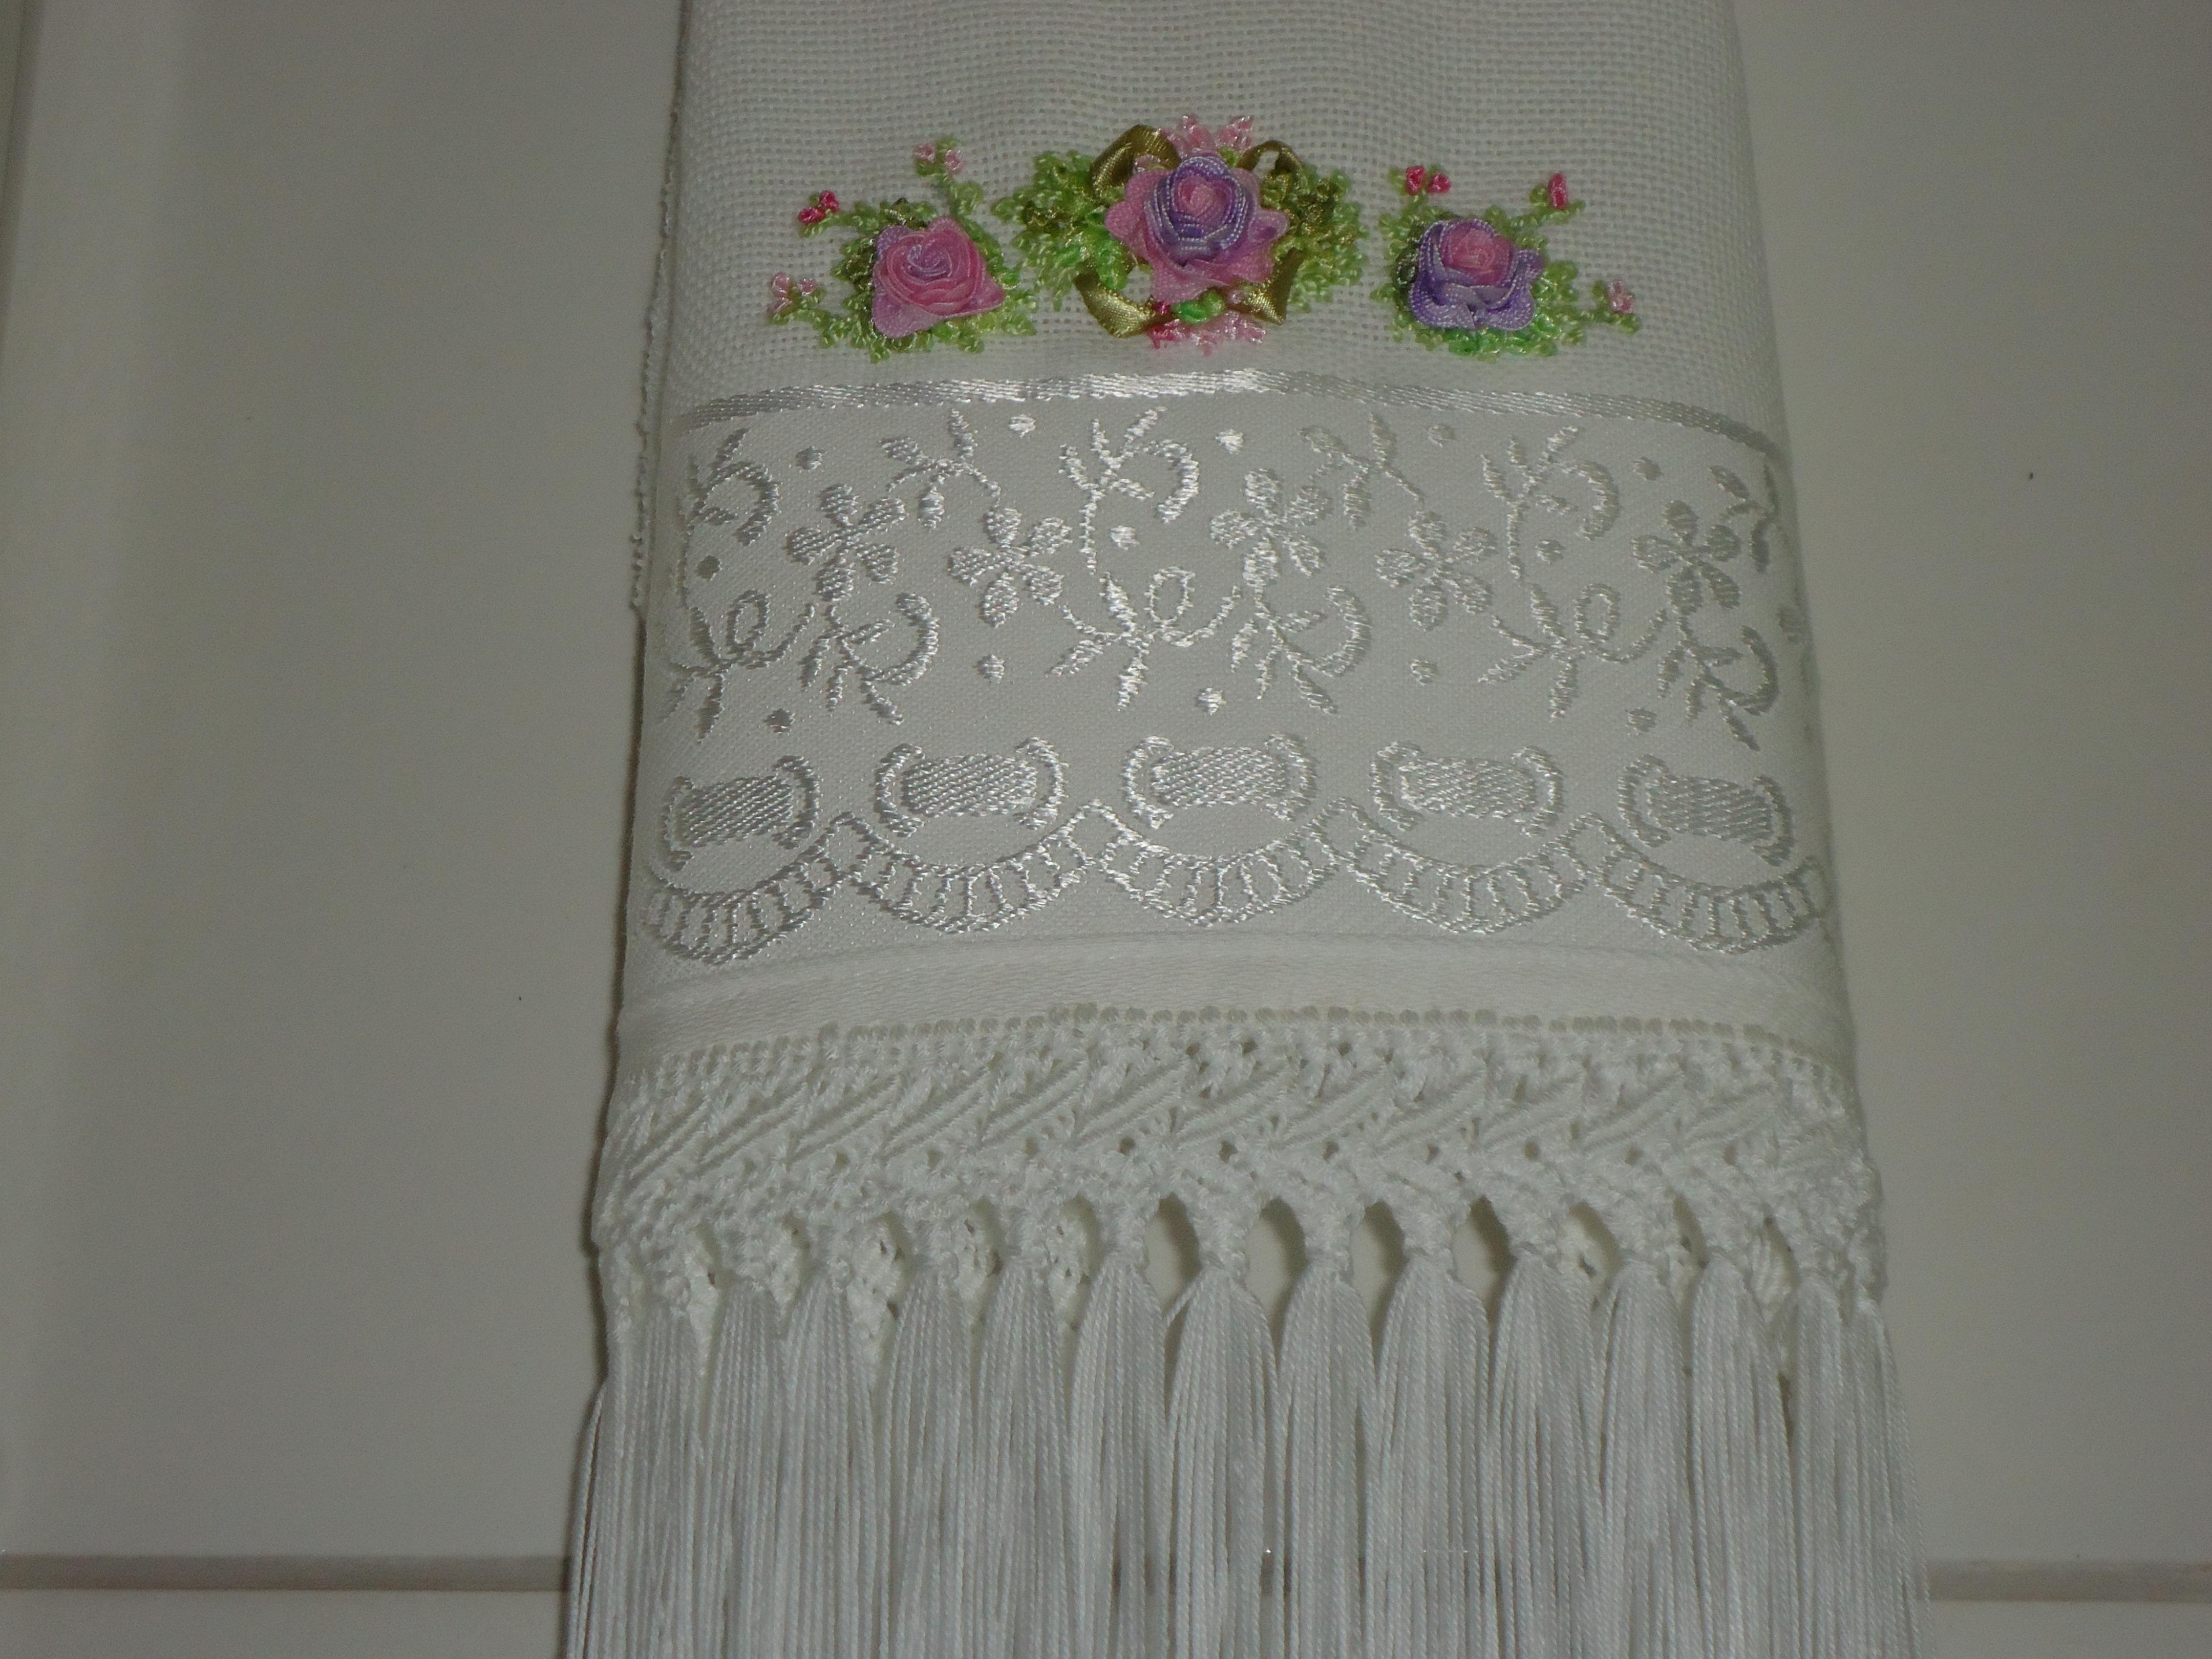 decoracao toalha lavabo:toalha de lavabo bordada com embalagem enxoval toalha de lavabo